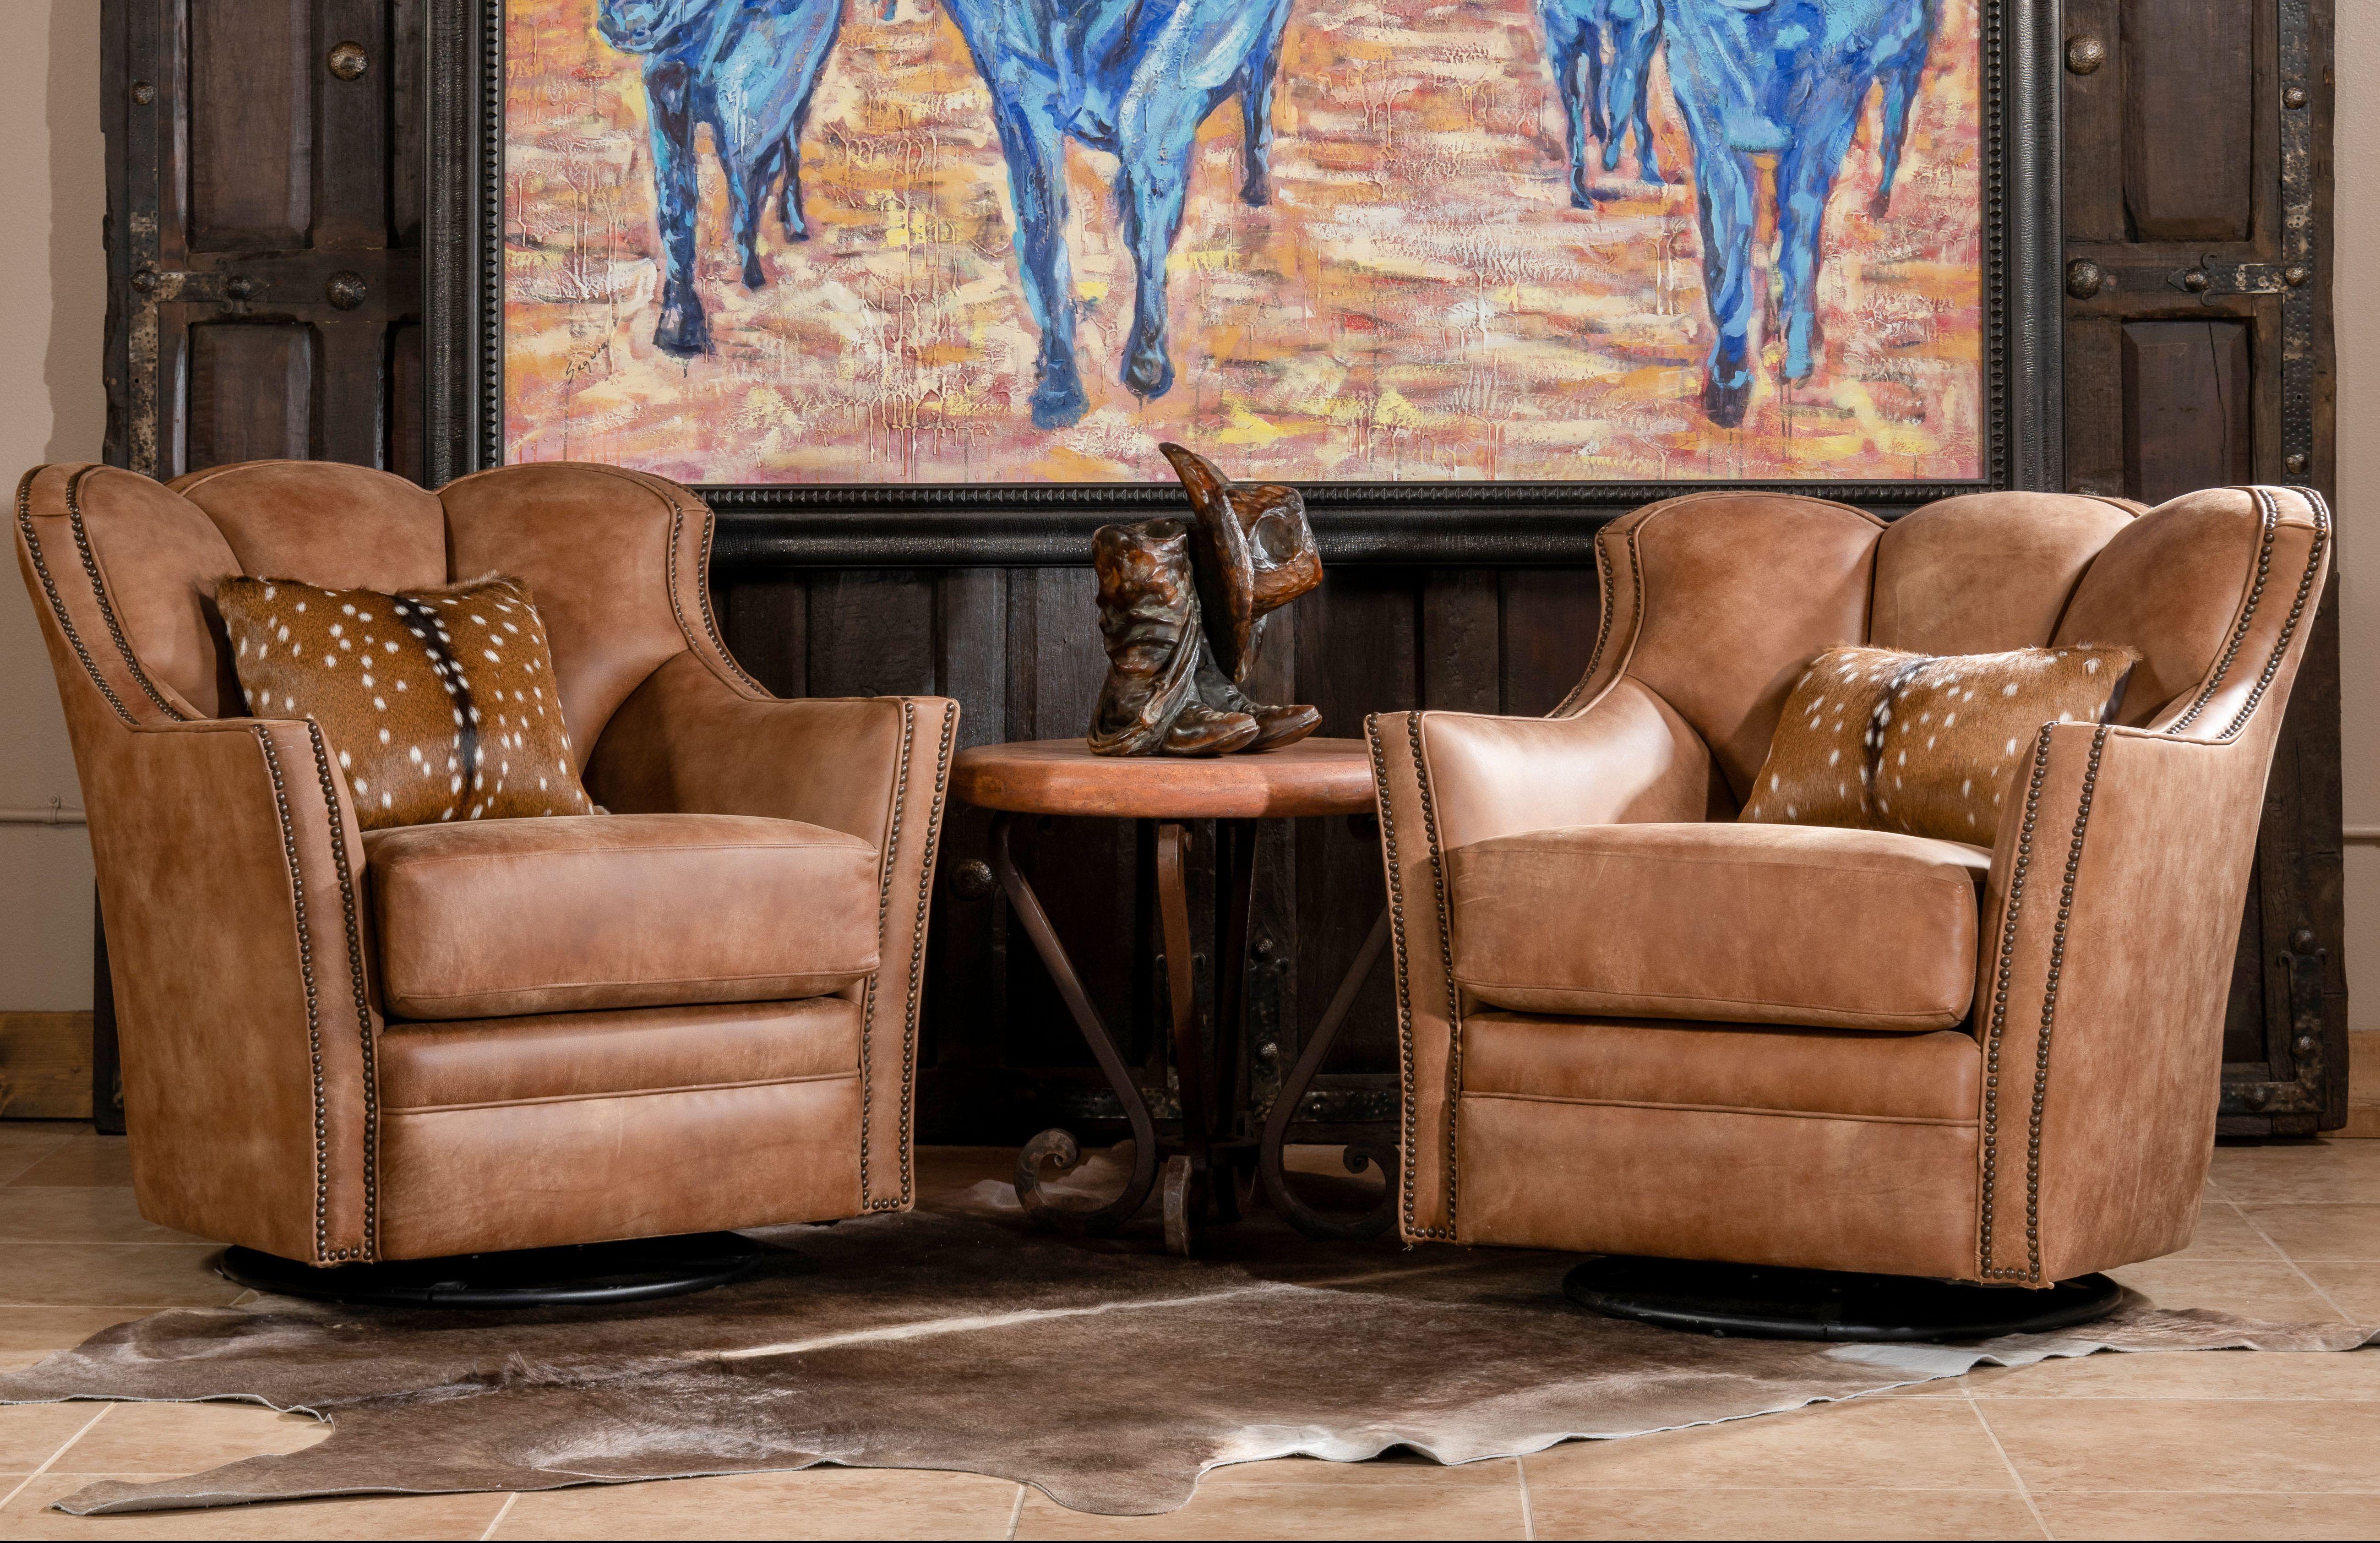 adobe interiors (with images)   interior, home decor